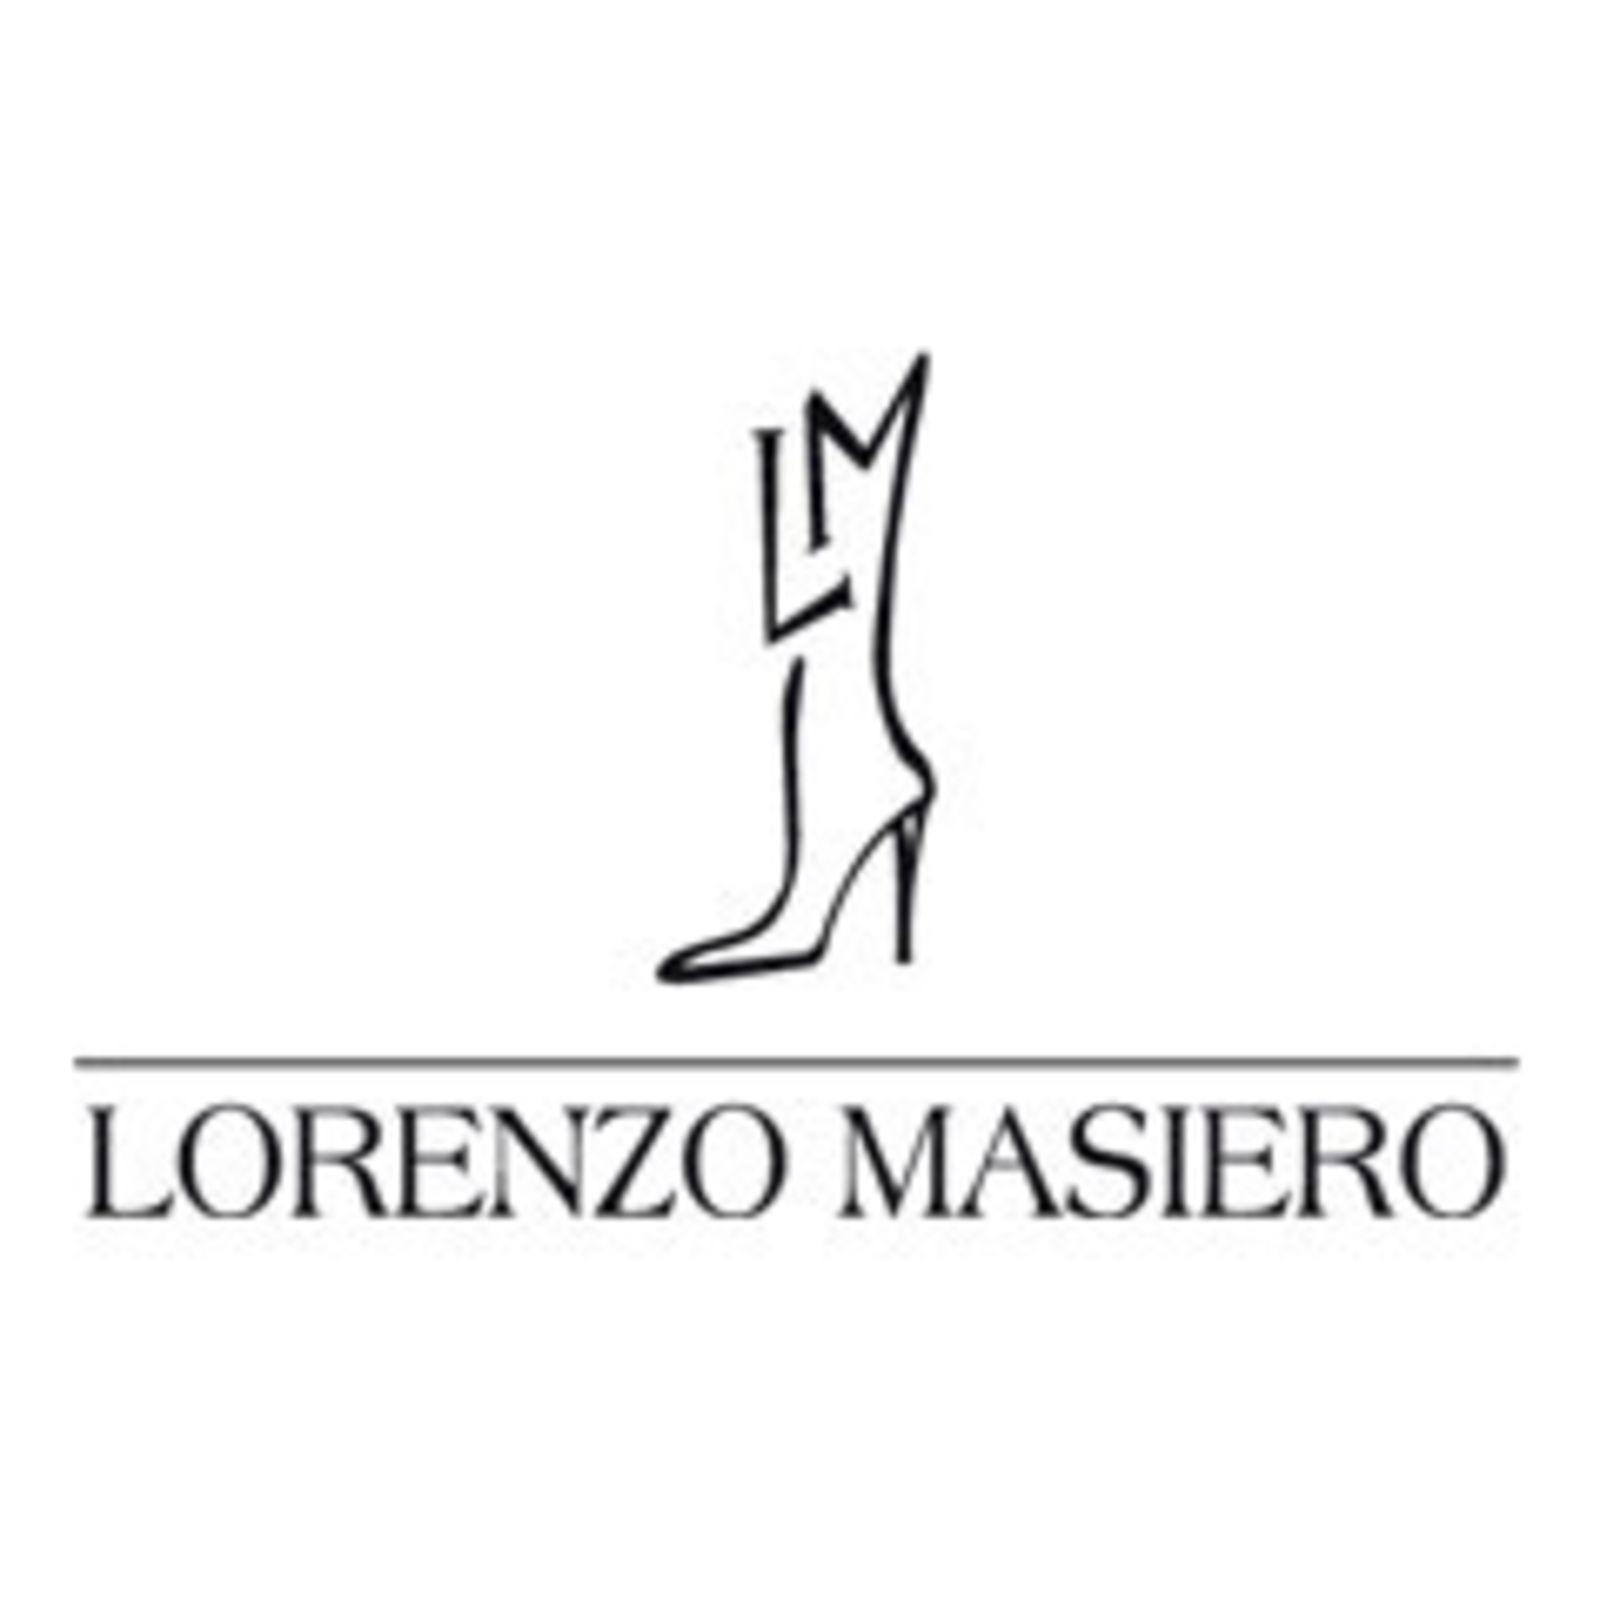 LORENZO MASIERO calzaturficio